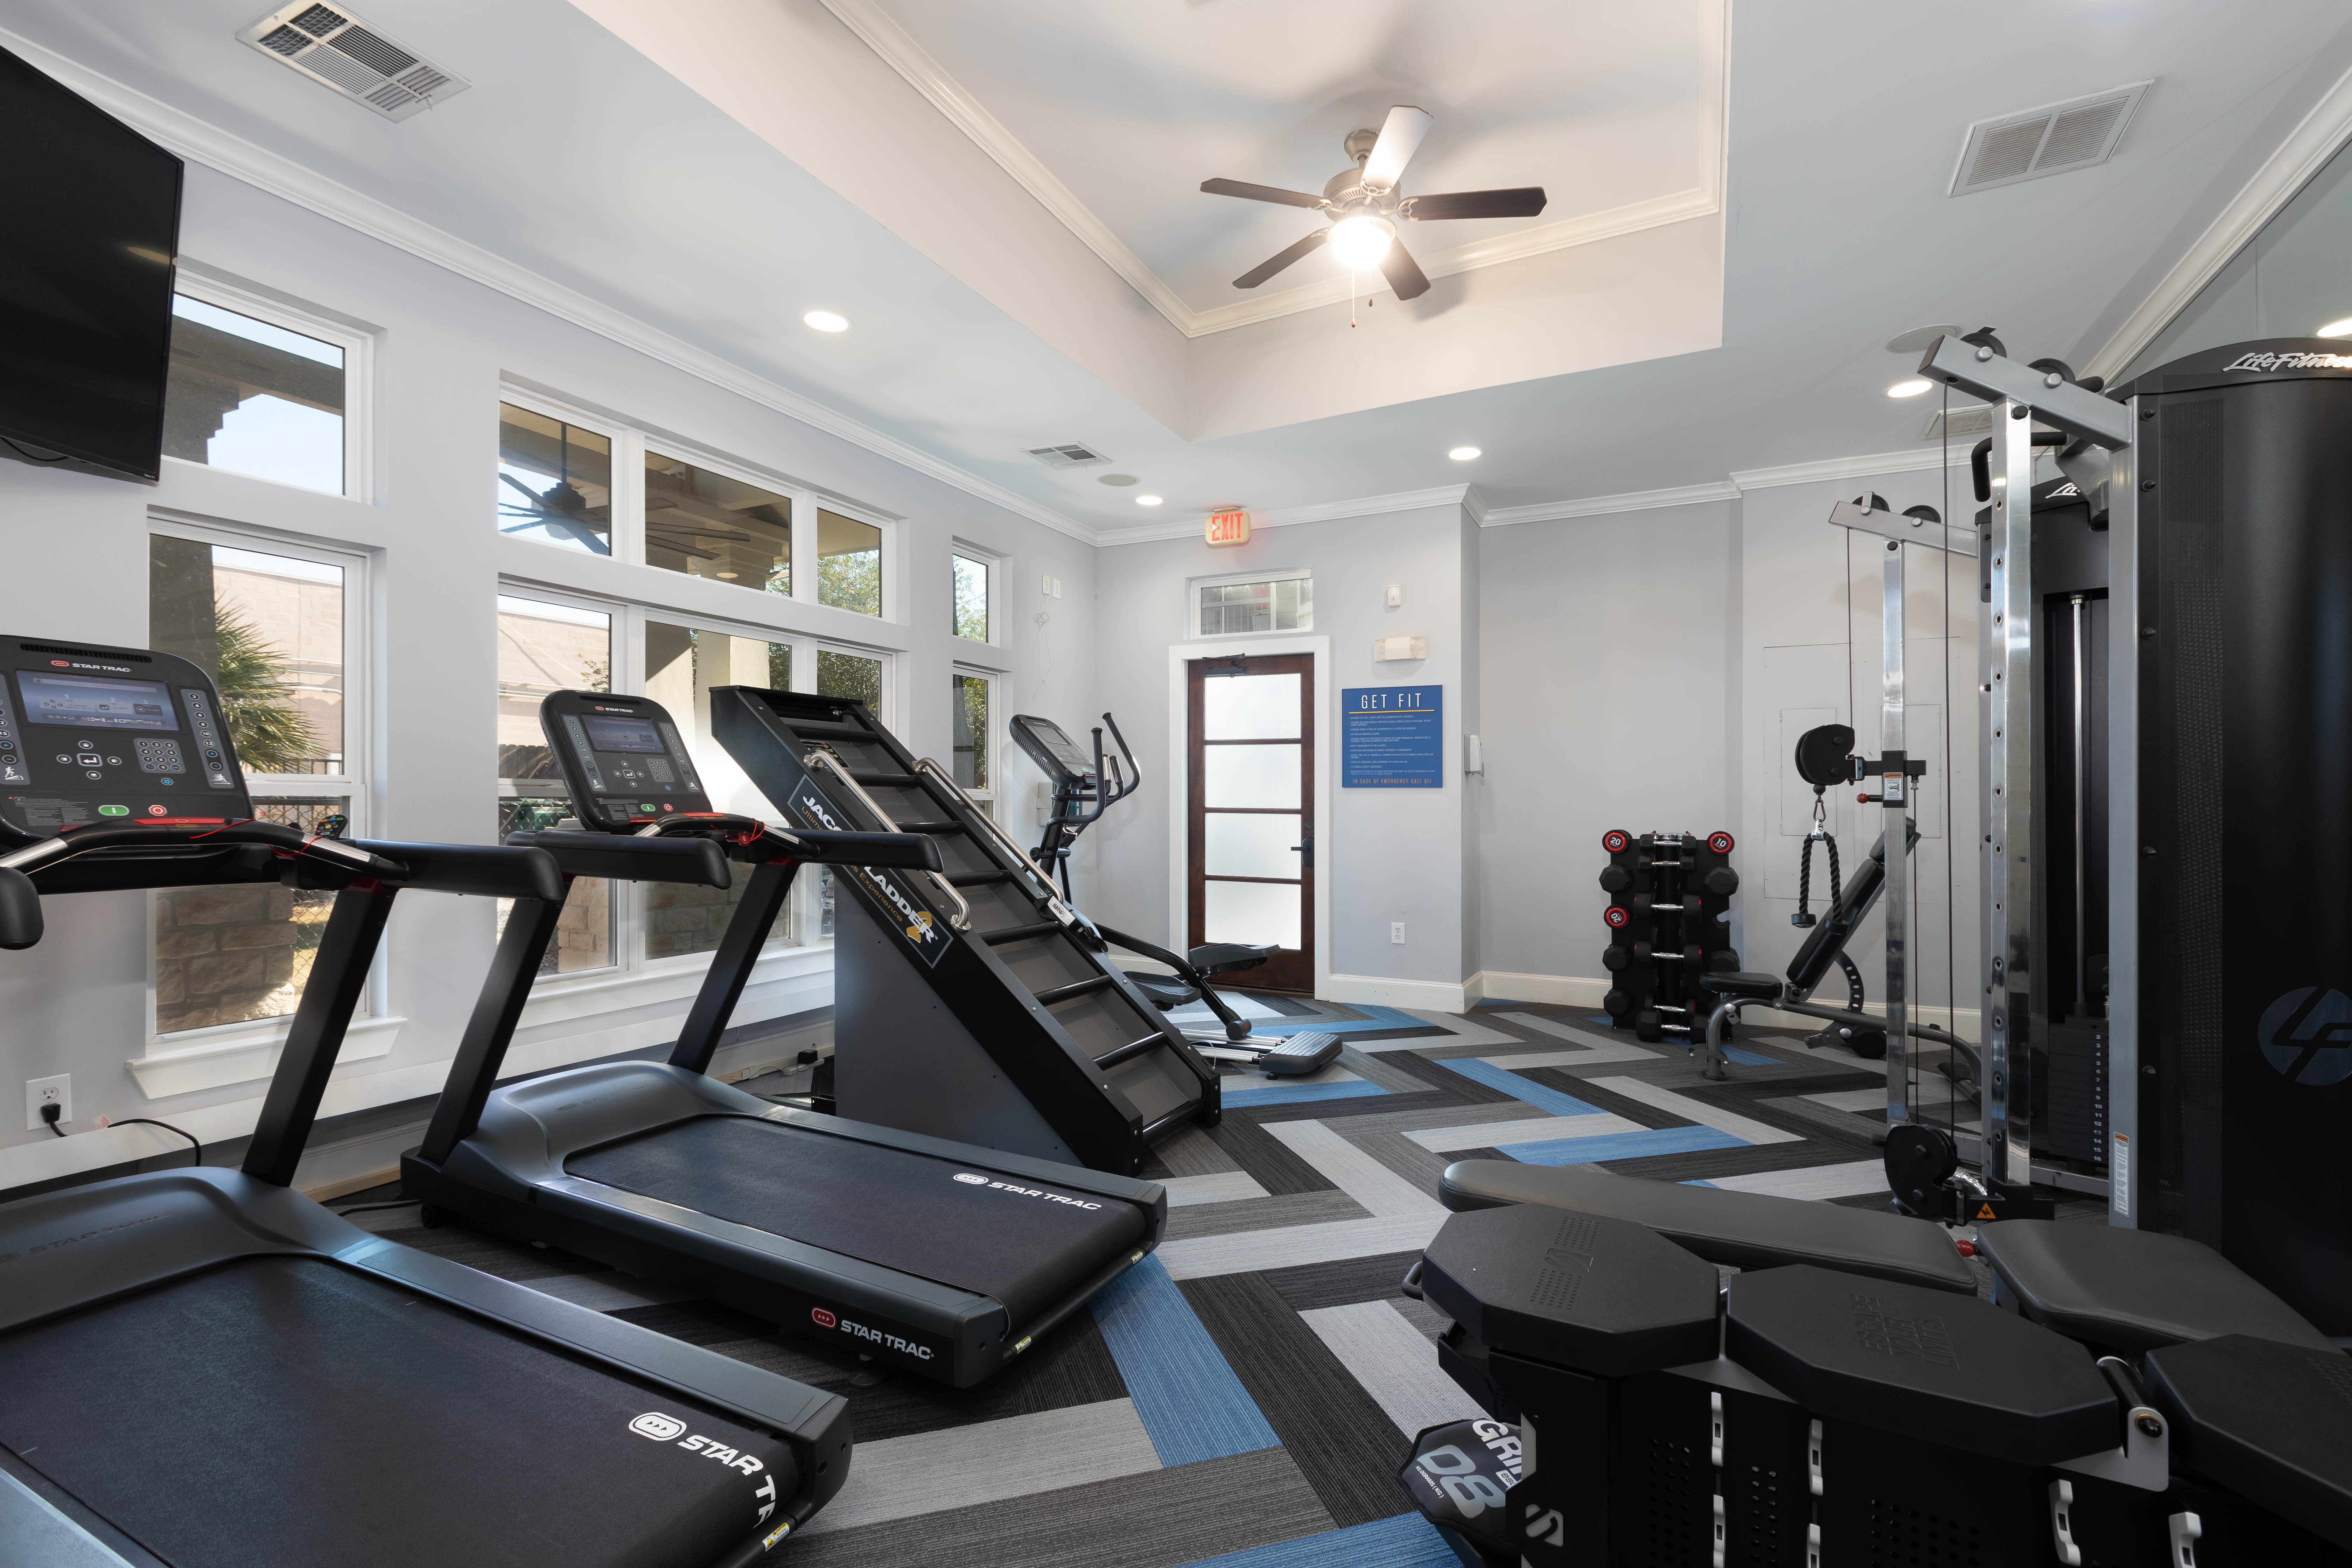 Fitness center at Lakefront Villas open 24/7